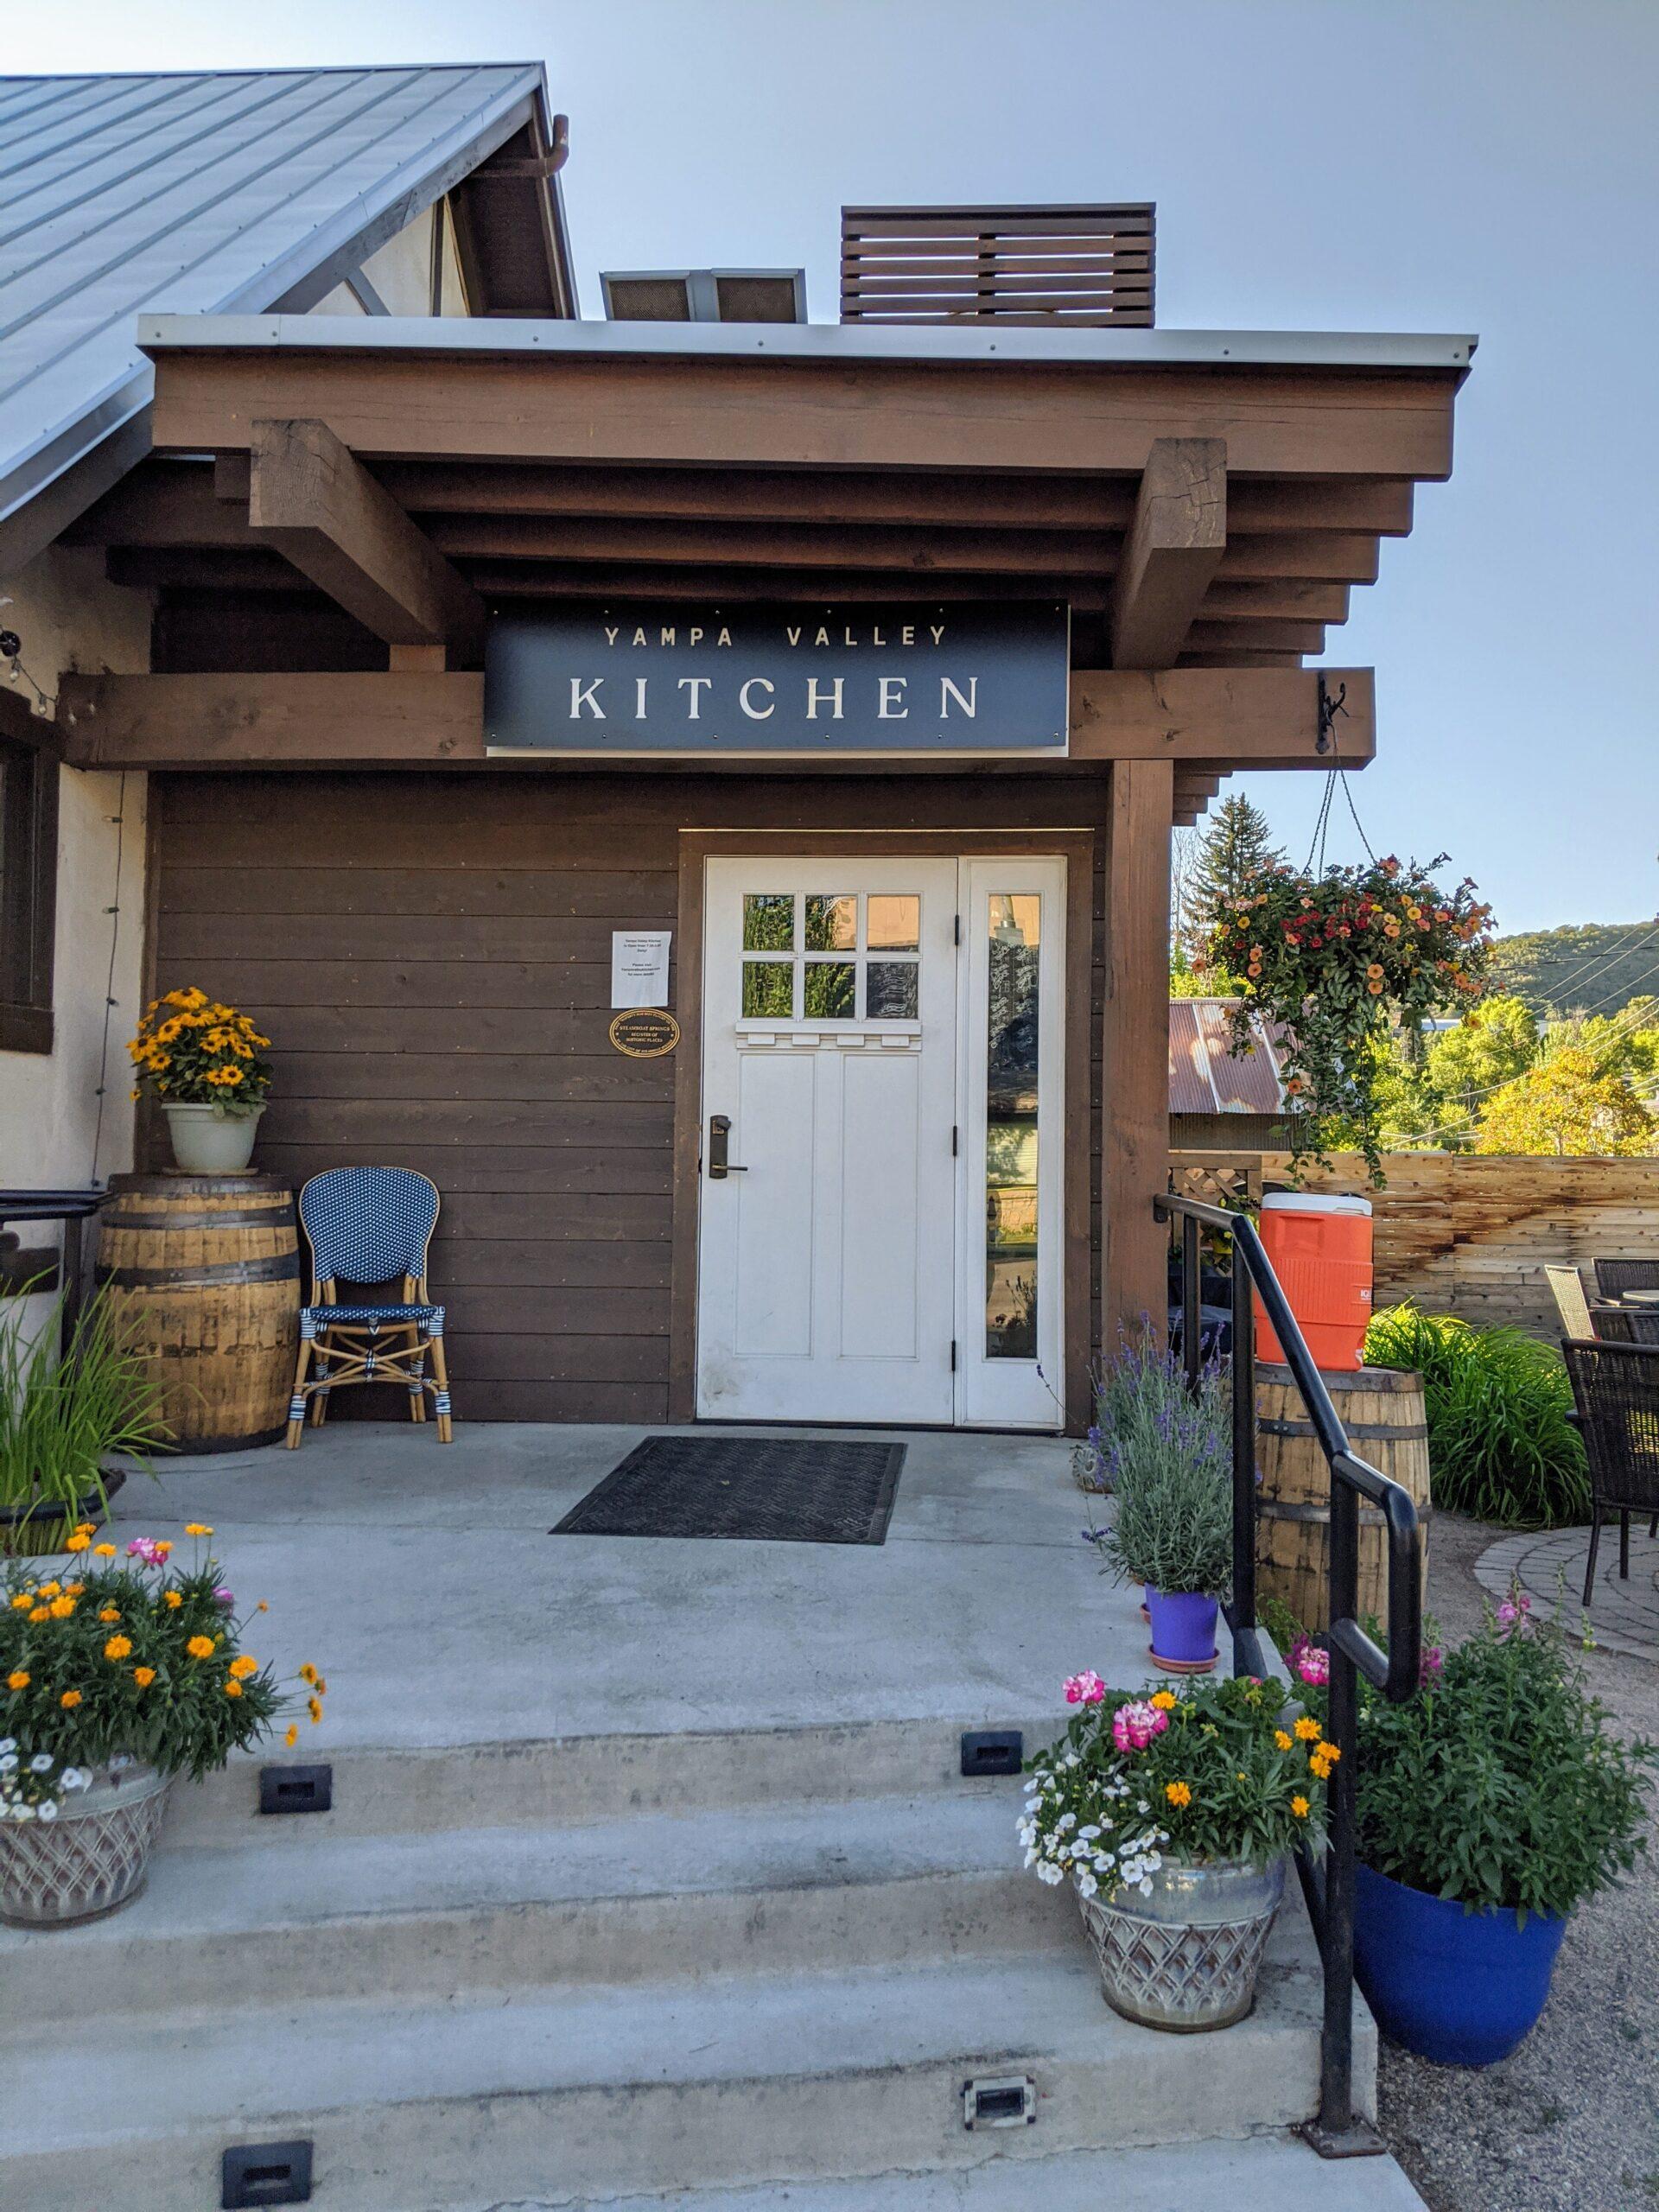 EAT-Yampa-Valley-Kitchen-Entrance